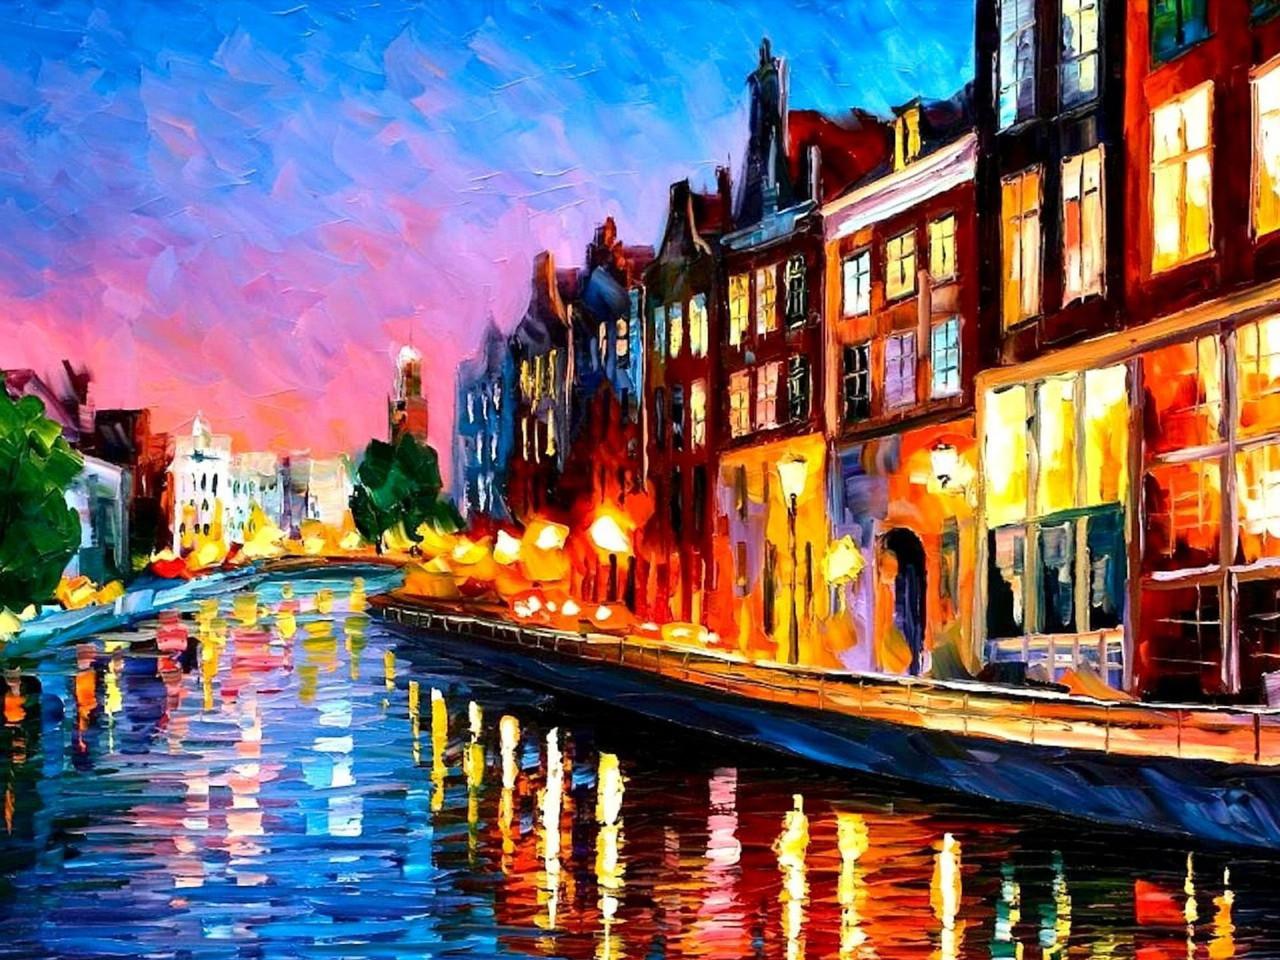 Картина по номерам Роспись на холсте Городской пейзаж Вечерний Амстердам КНО2142 без коробки